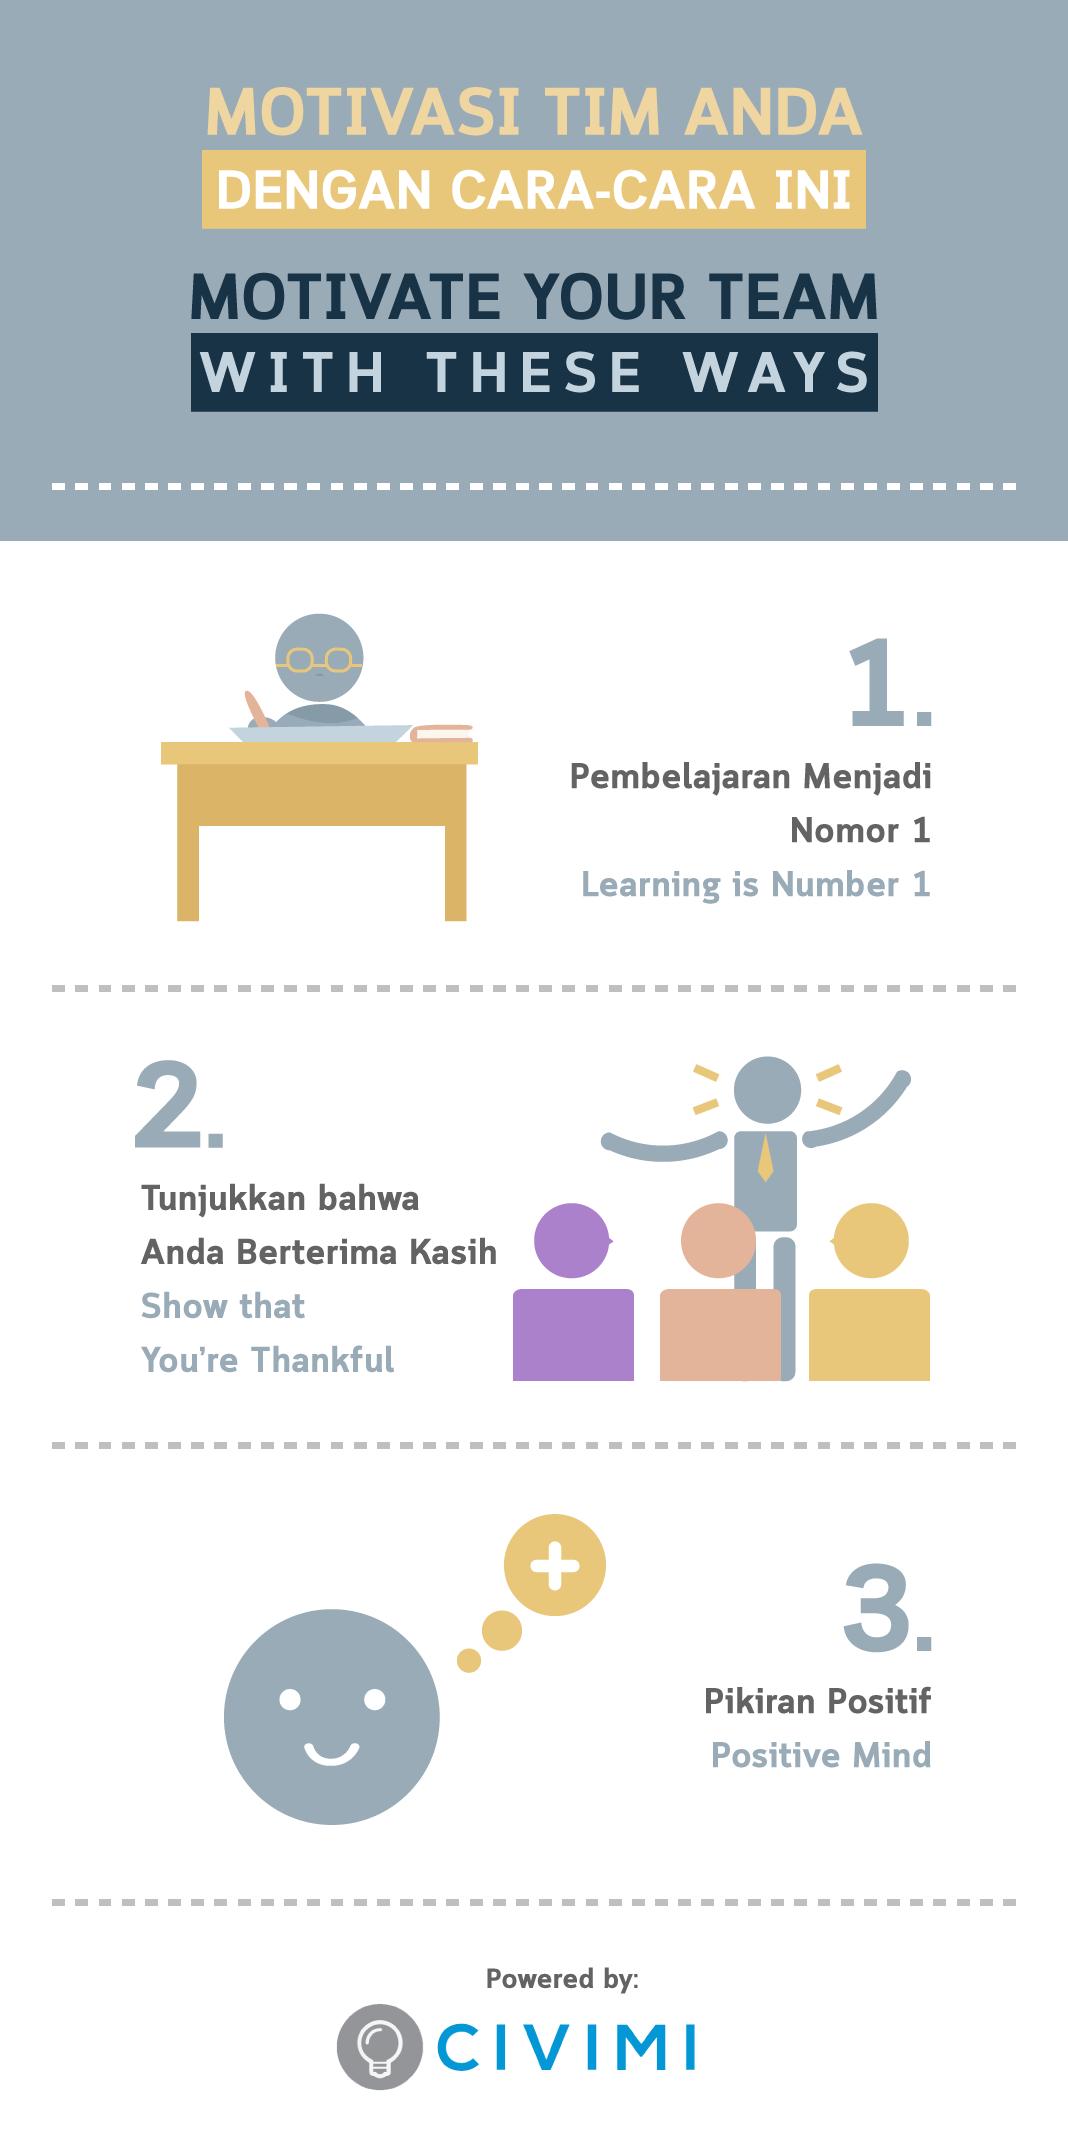 Motivasi Tim Anda Dengan Cara Cara Ini Motivate Your Team With These Ways Infographic Motivasi Kutipan Inspirasional Kerja Tim